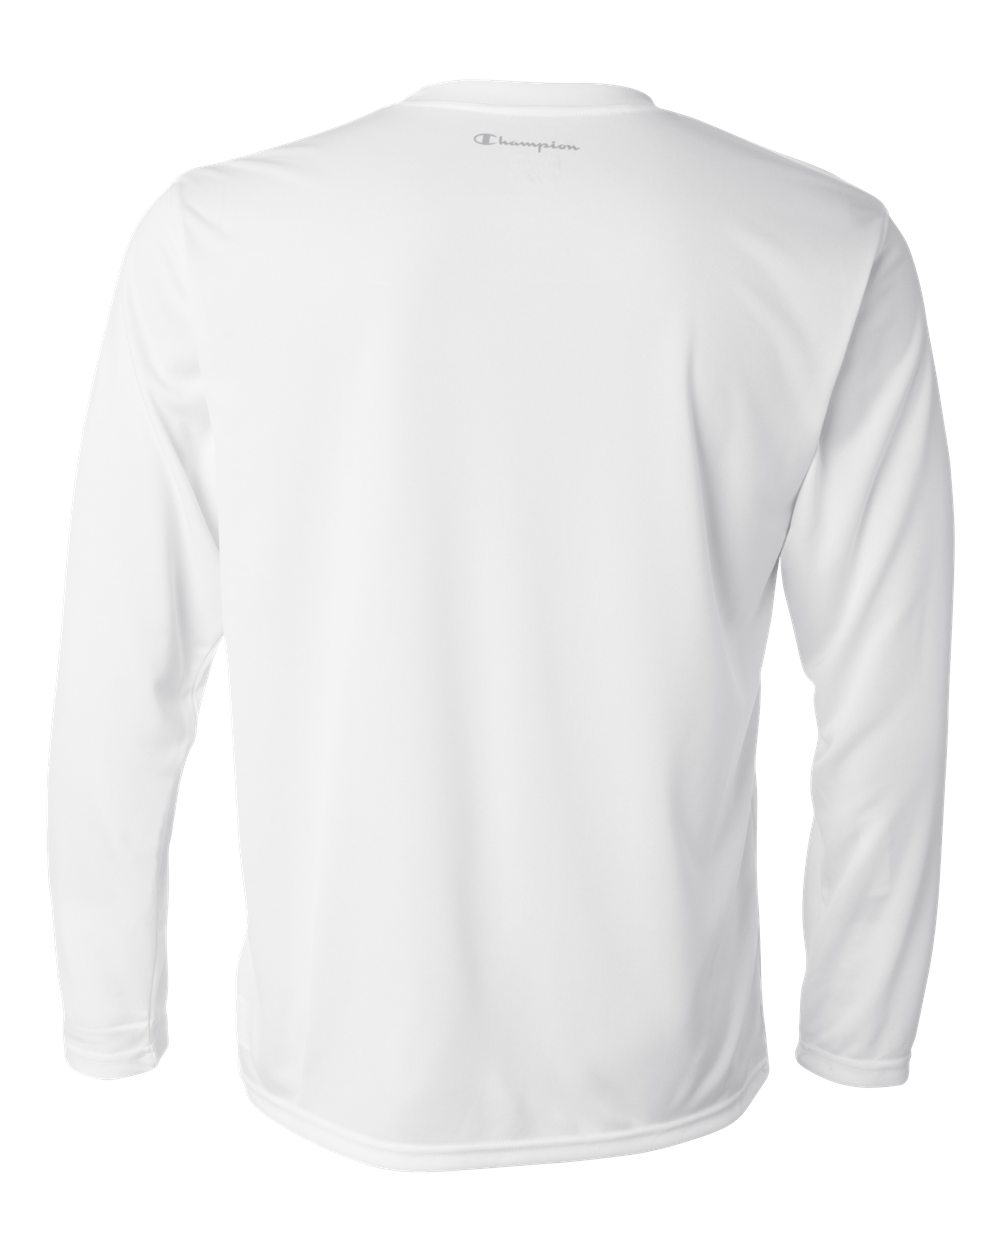 Champion-Men-039-s-Double-Dry-4-1-oz-Long-Sleeve-Interlock-T-Shirt-CW26-XS-3XL thumbnail 34